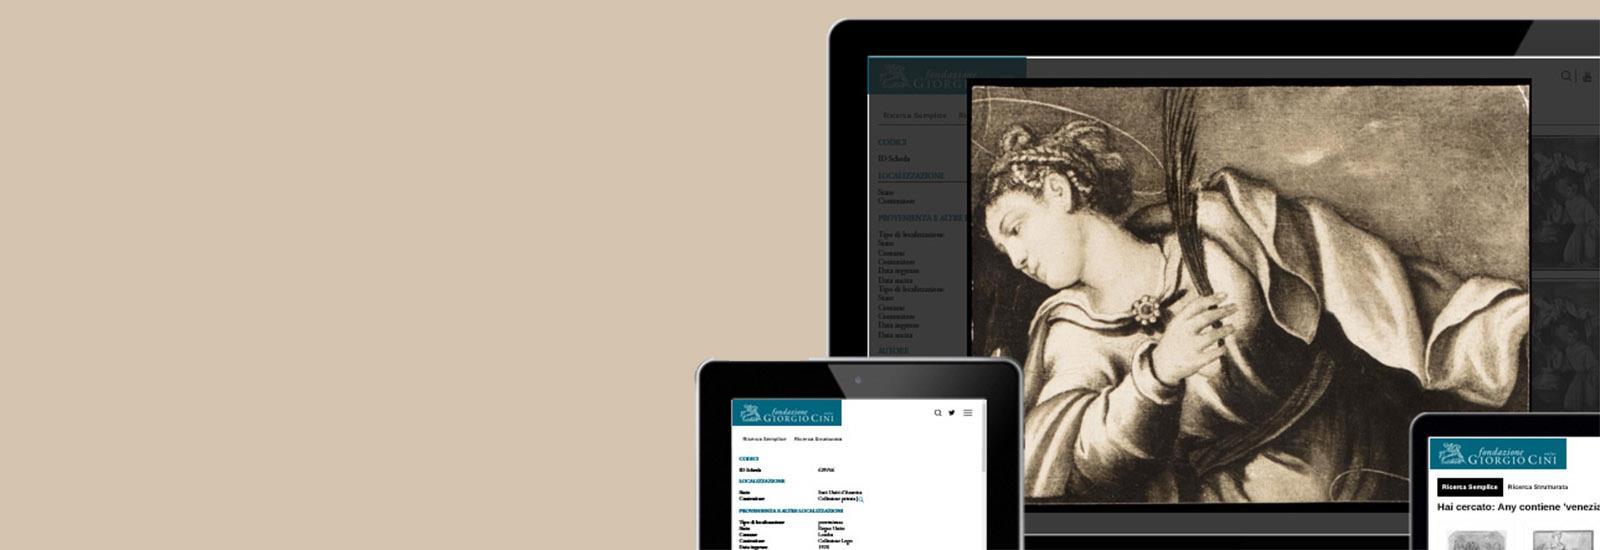 b776d1398b SICAPWeb - catalogazione musei archivi e fotografie - scheda F S OA -  standard ICCD